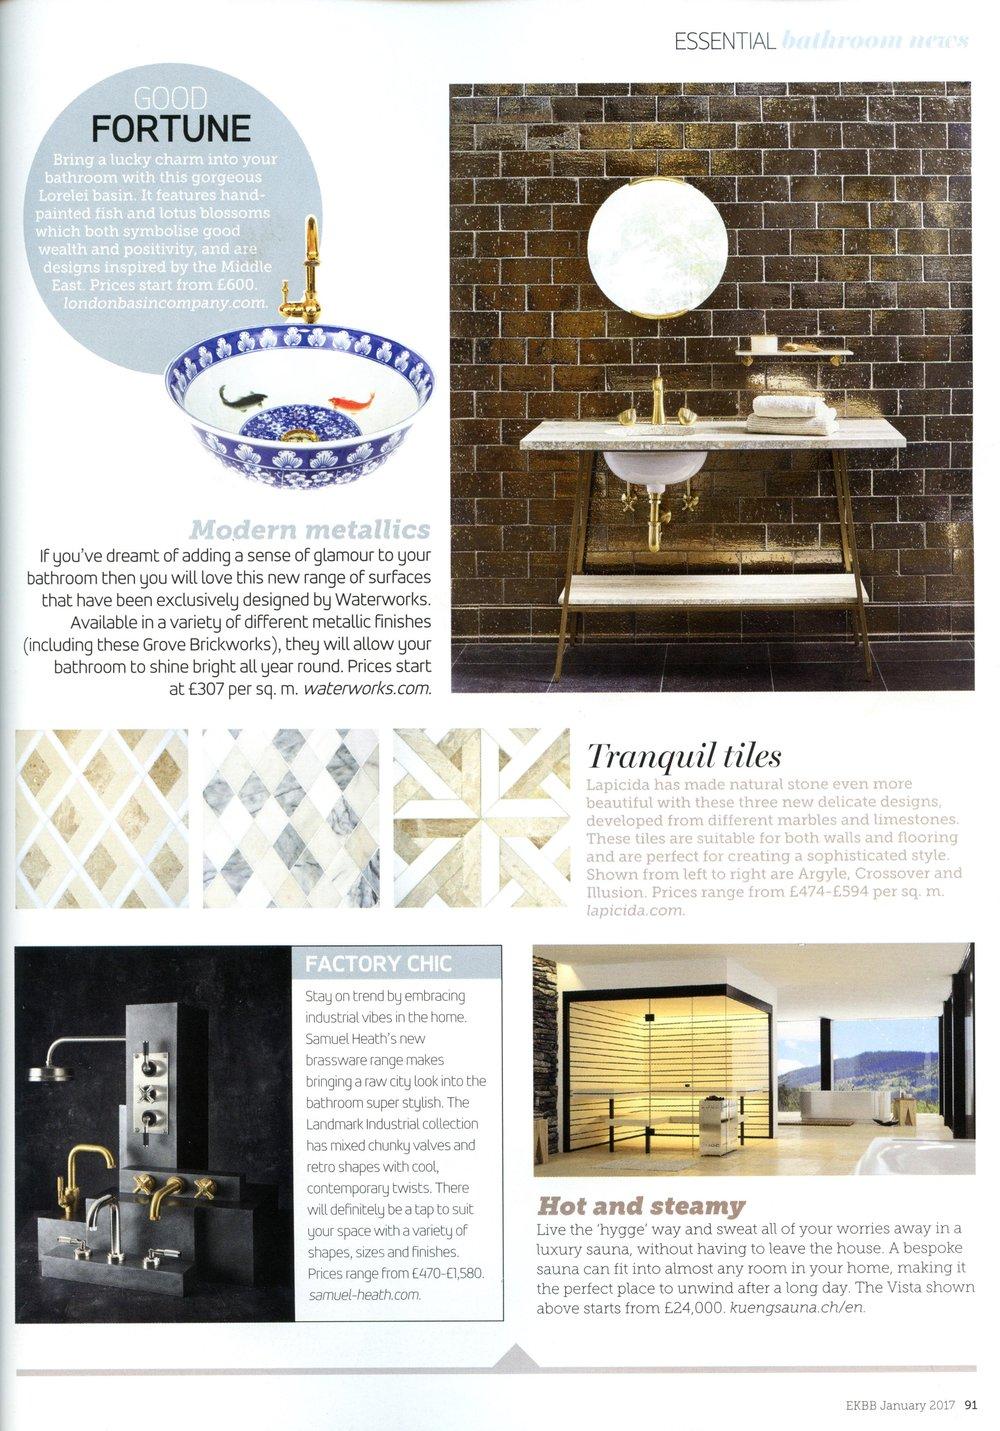 Essential Kitchen Bathroom Bedroom January 2017 LBC.jpg